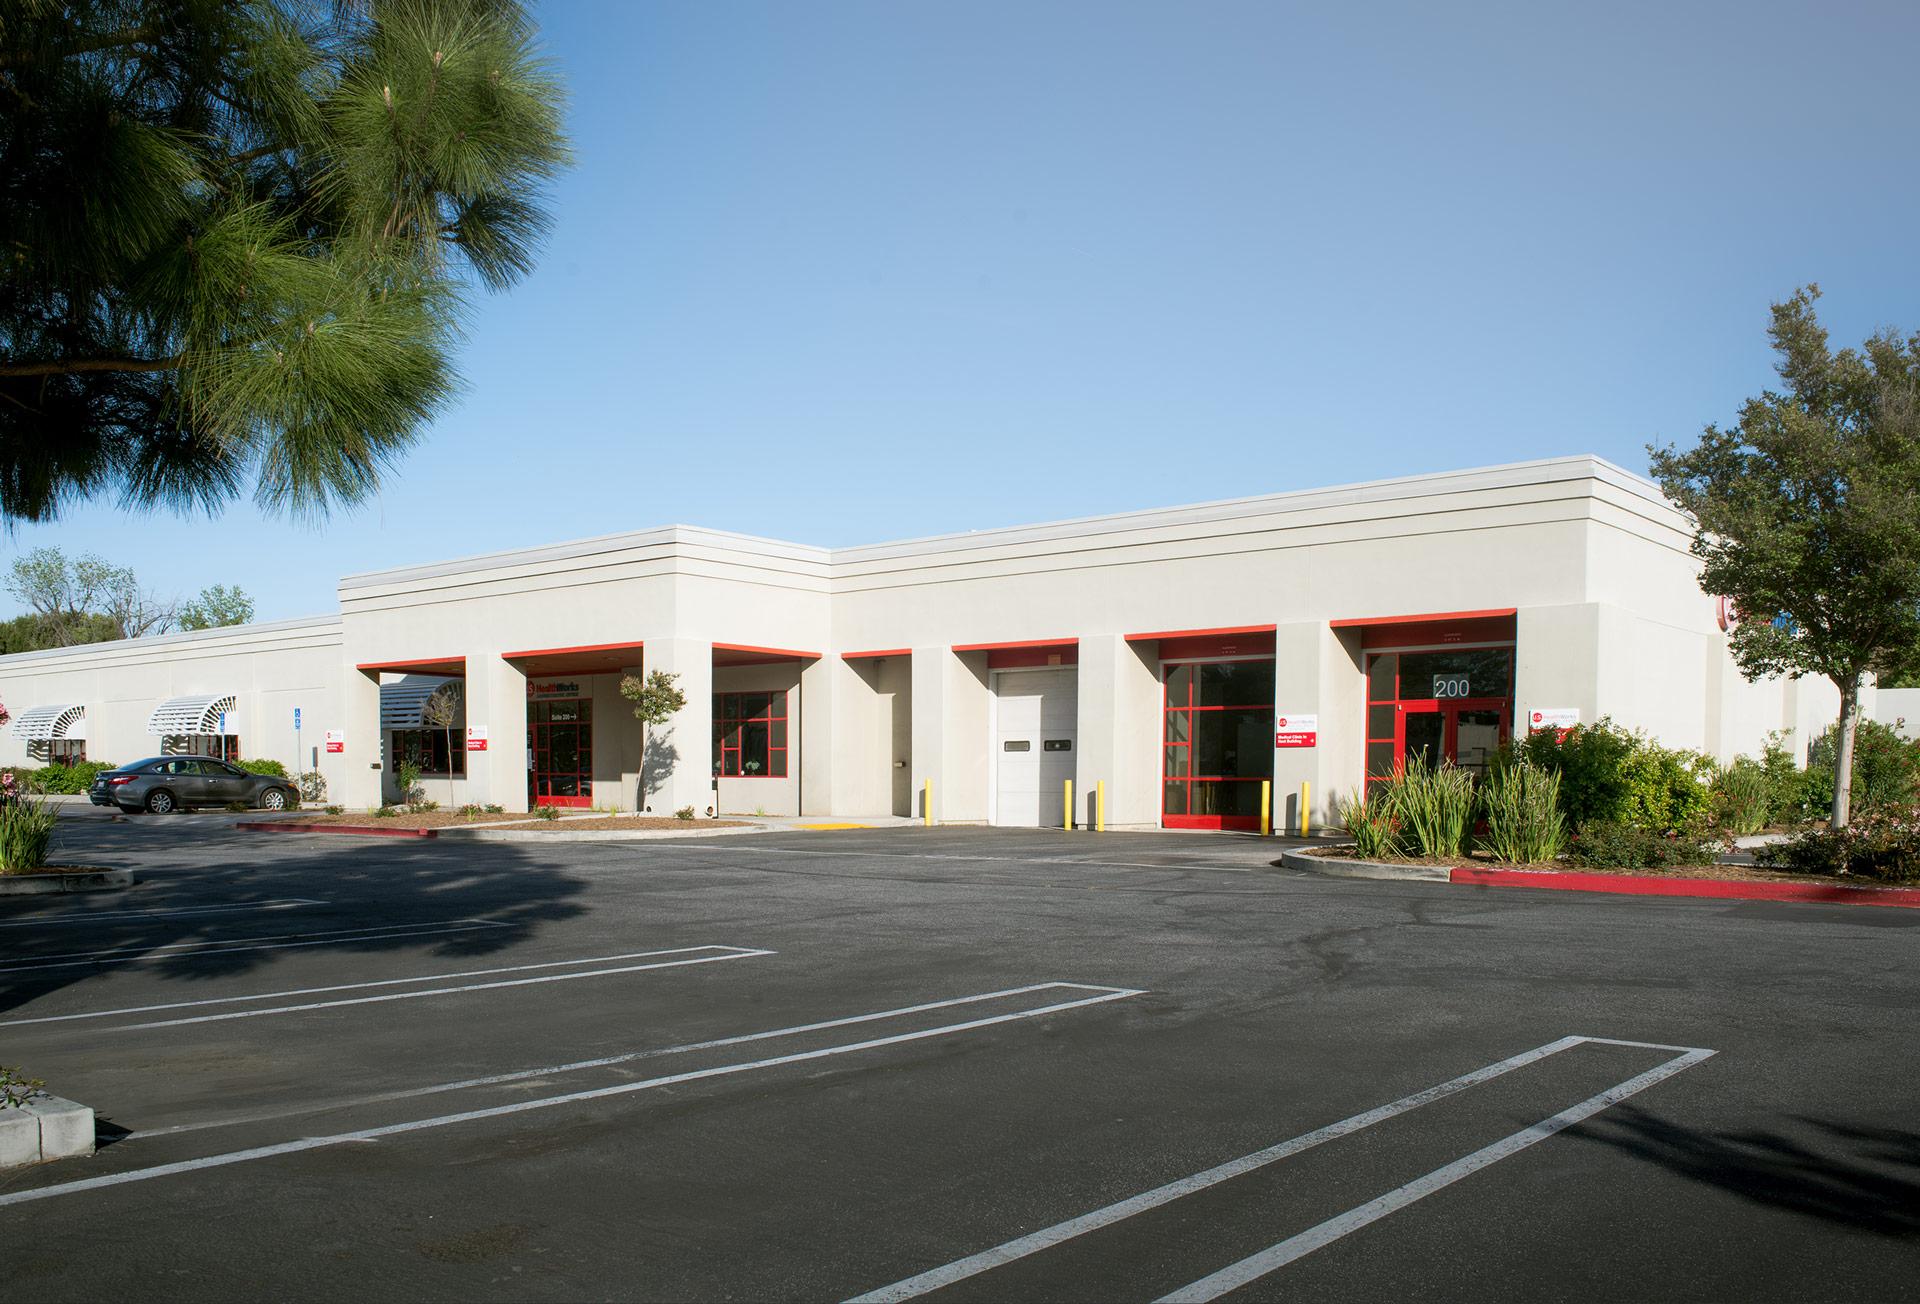 28035 Avenue Stanford, Santa Clarita, CA 91355